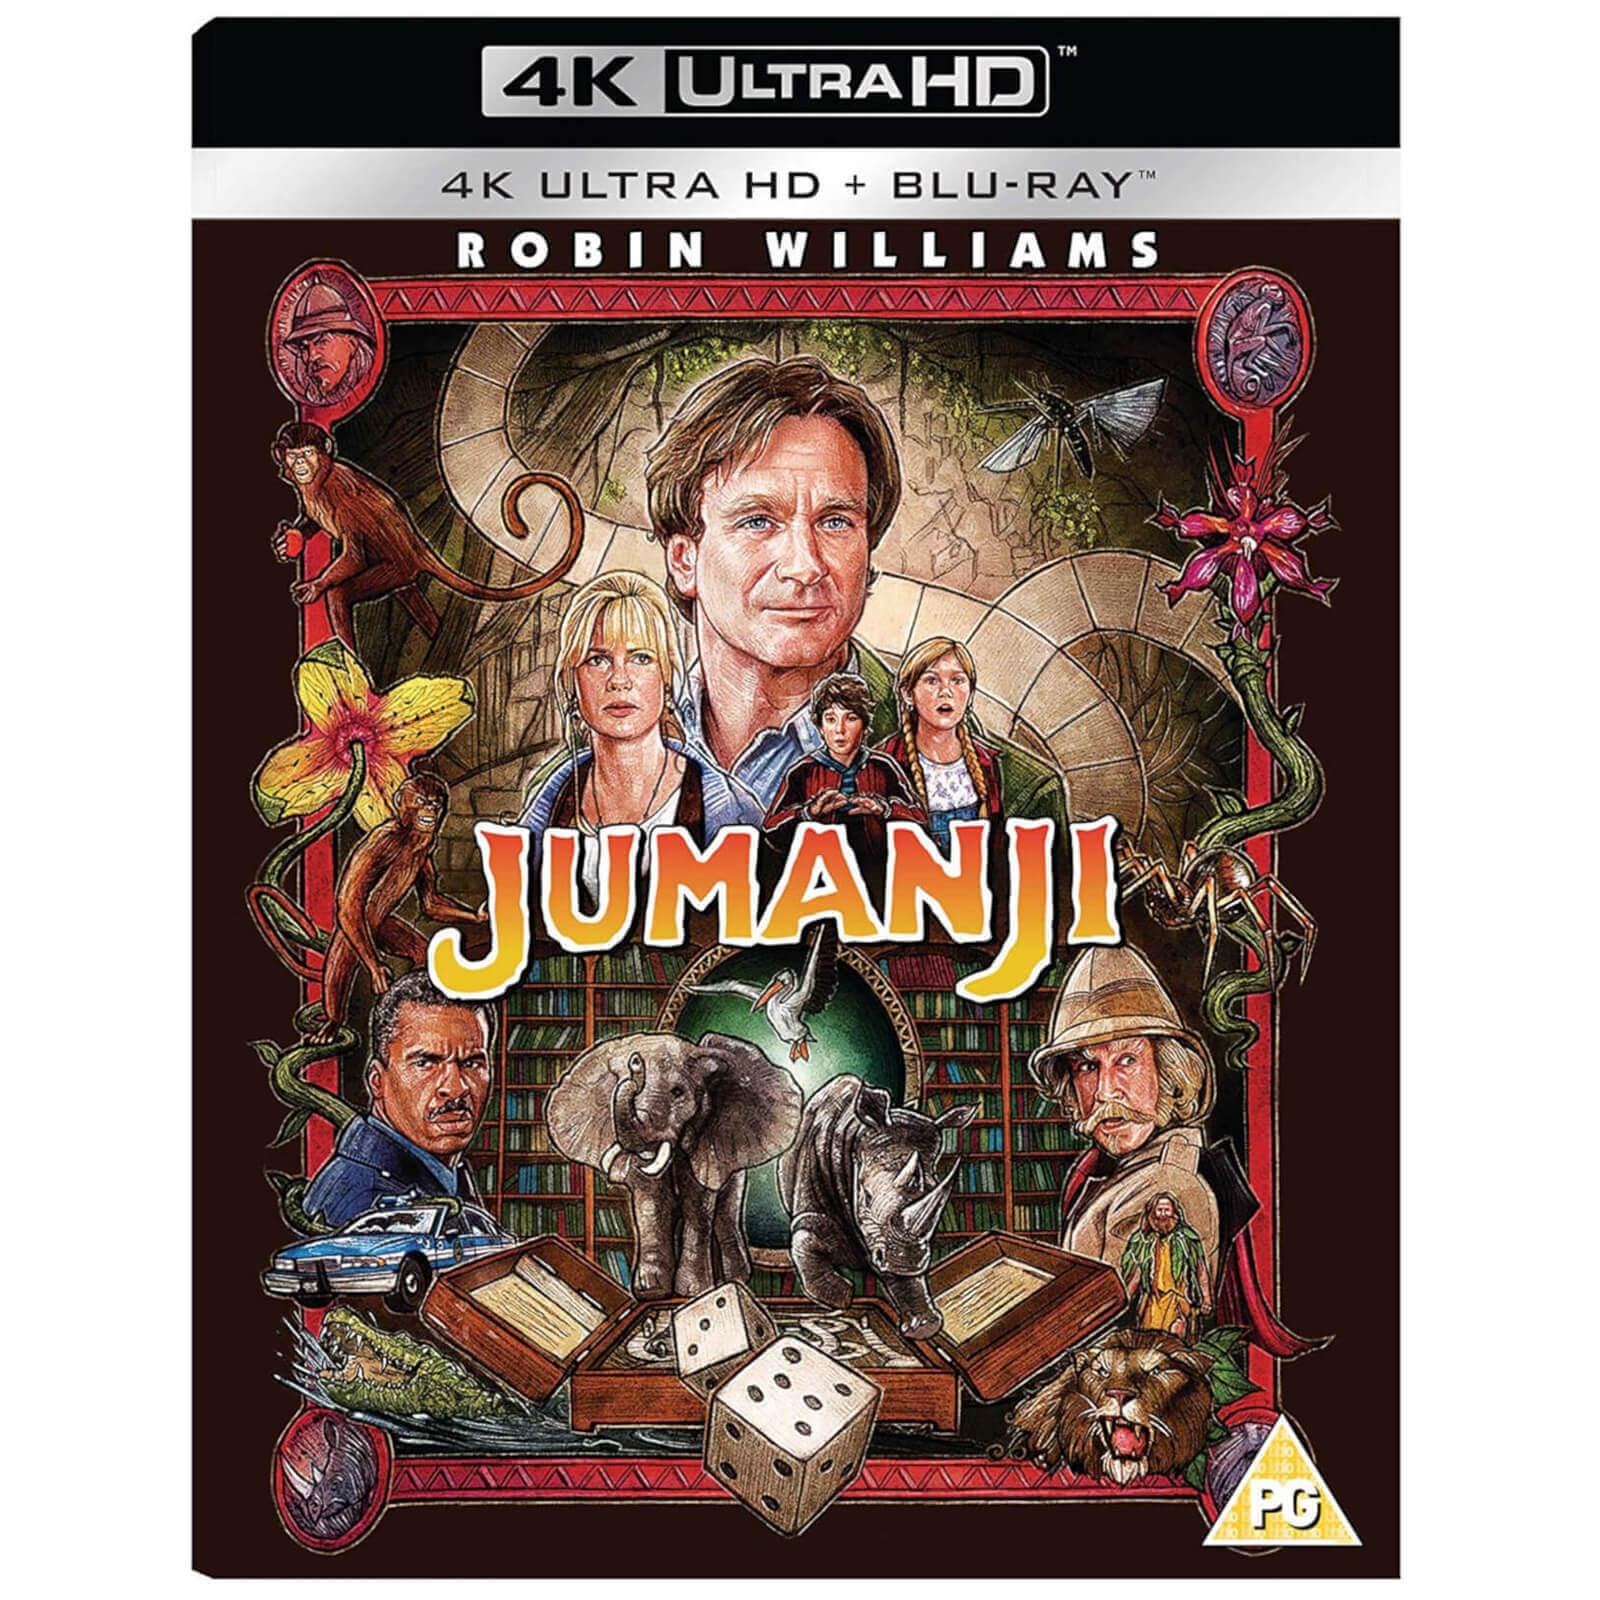 Sony Jumanji - 4K Ultra HD (Includes Blu-ray)